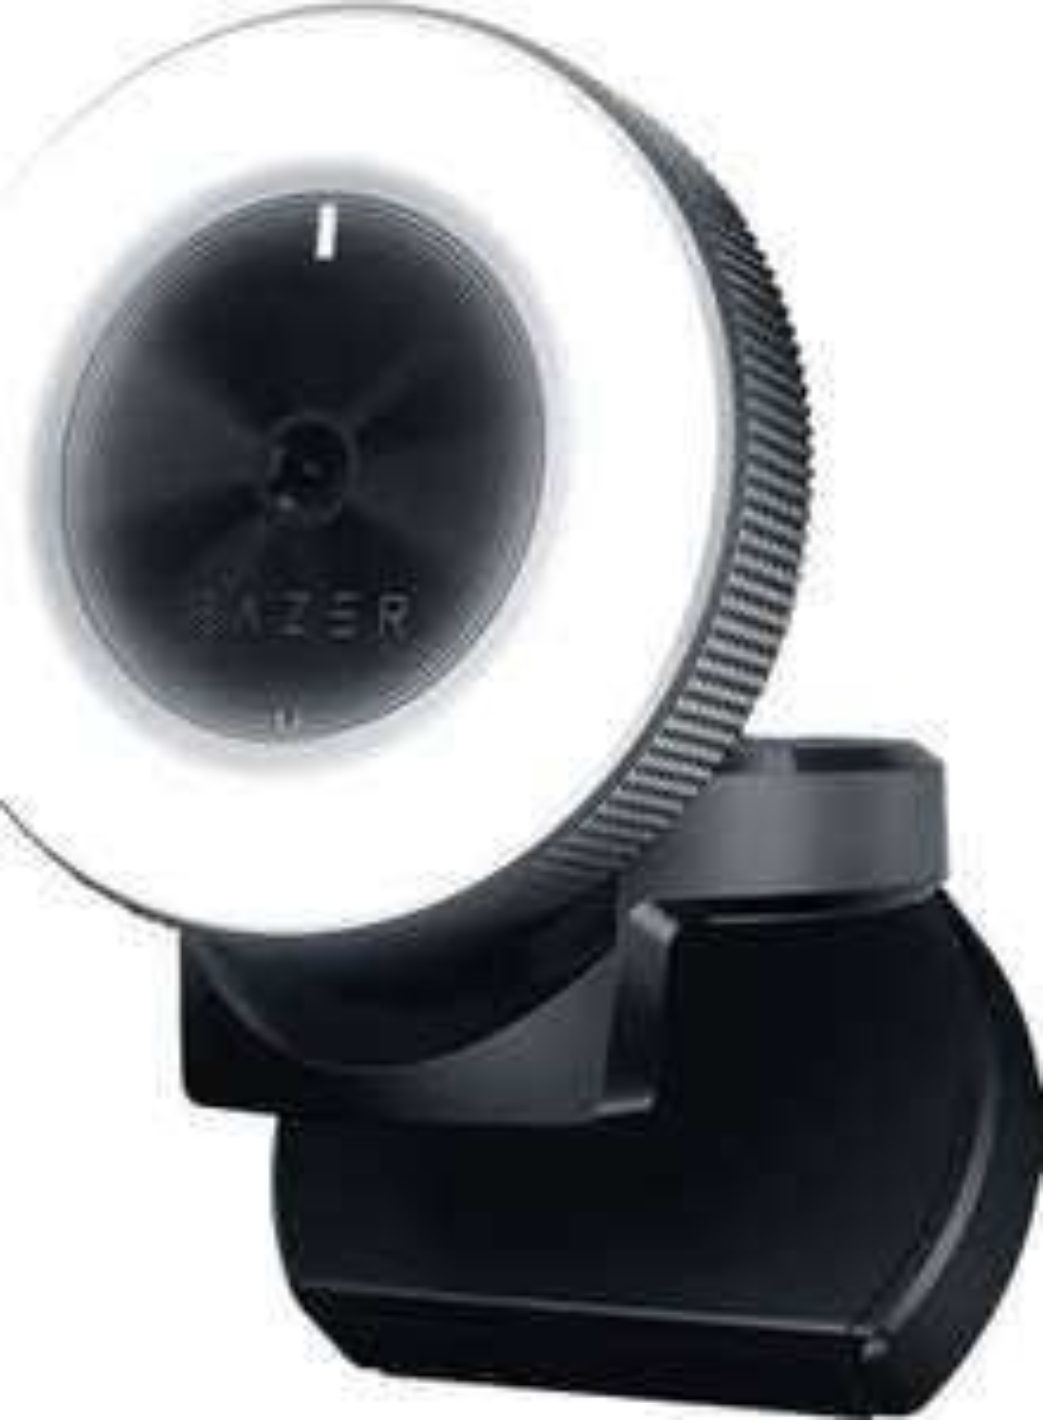 Webcam Razer Kiyo - 1080p 30fps / 720p 60fps